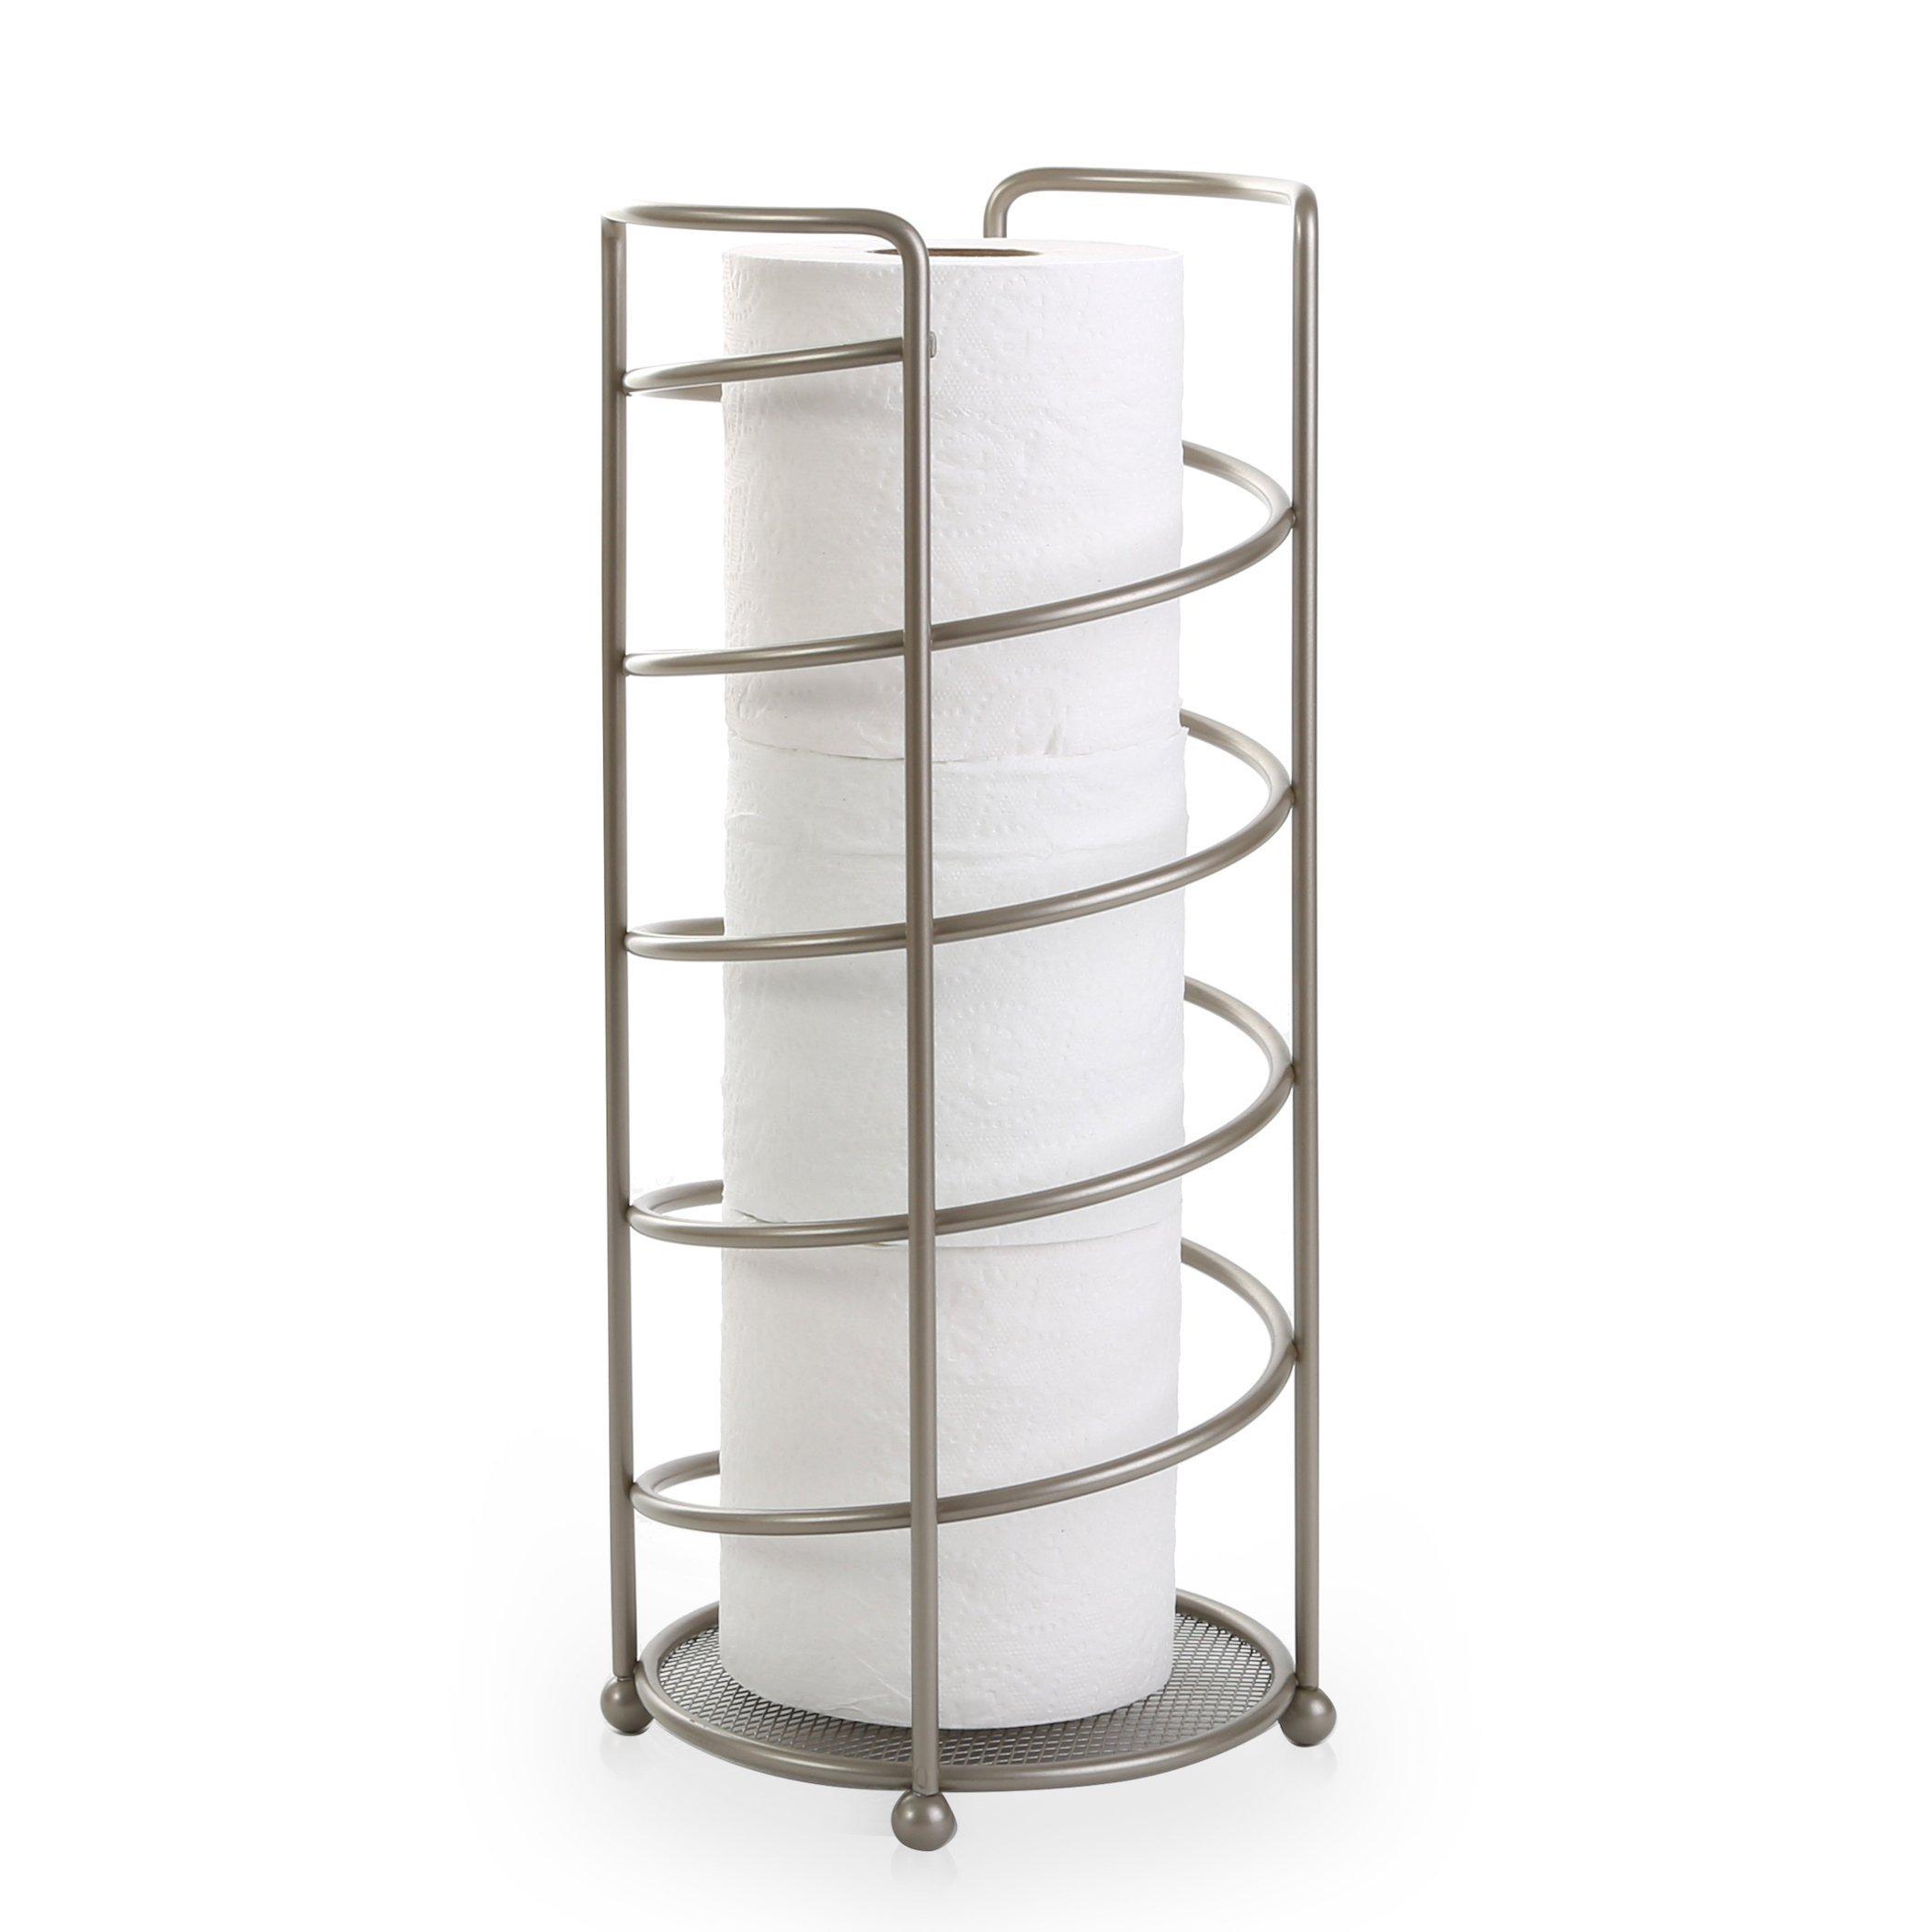 BINO Spiral' Toilet Paper Holder